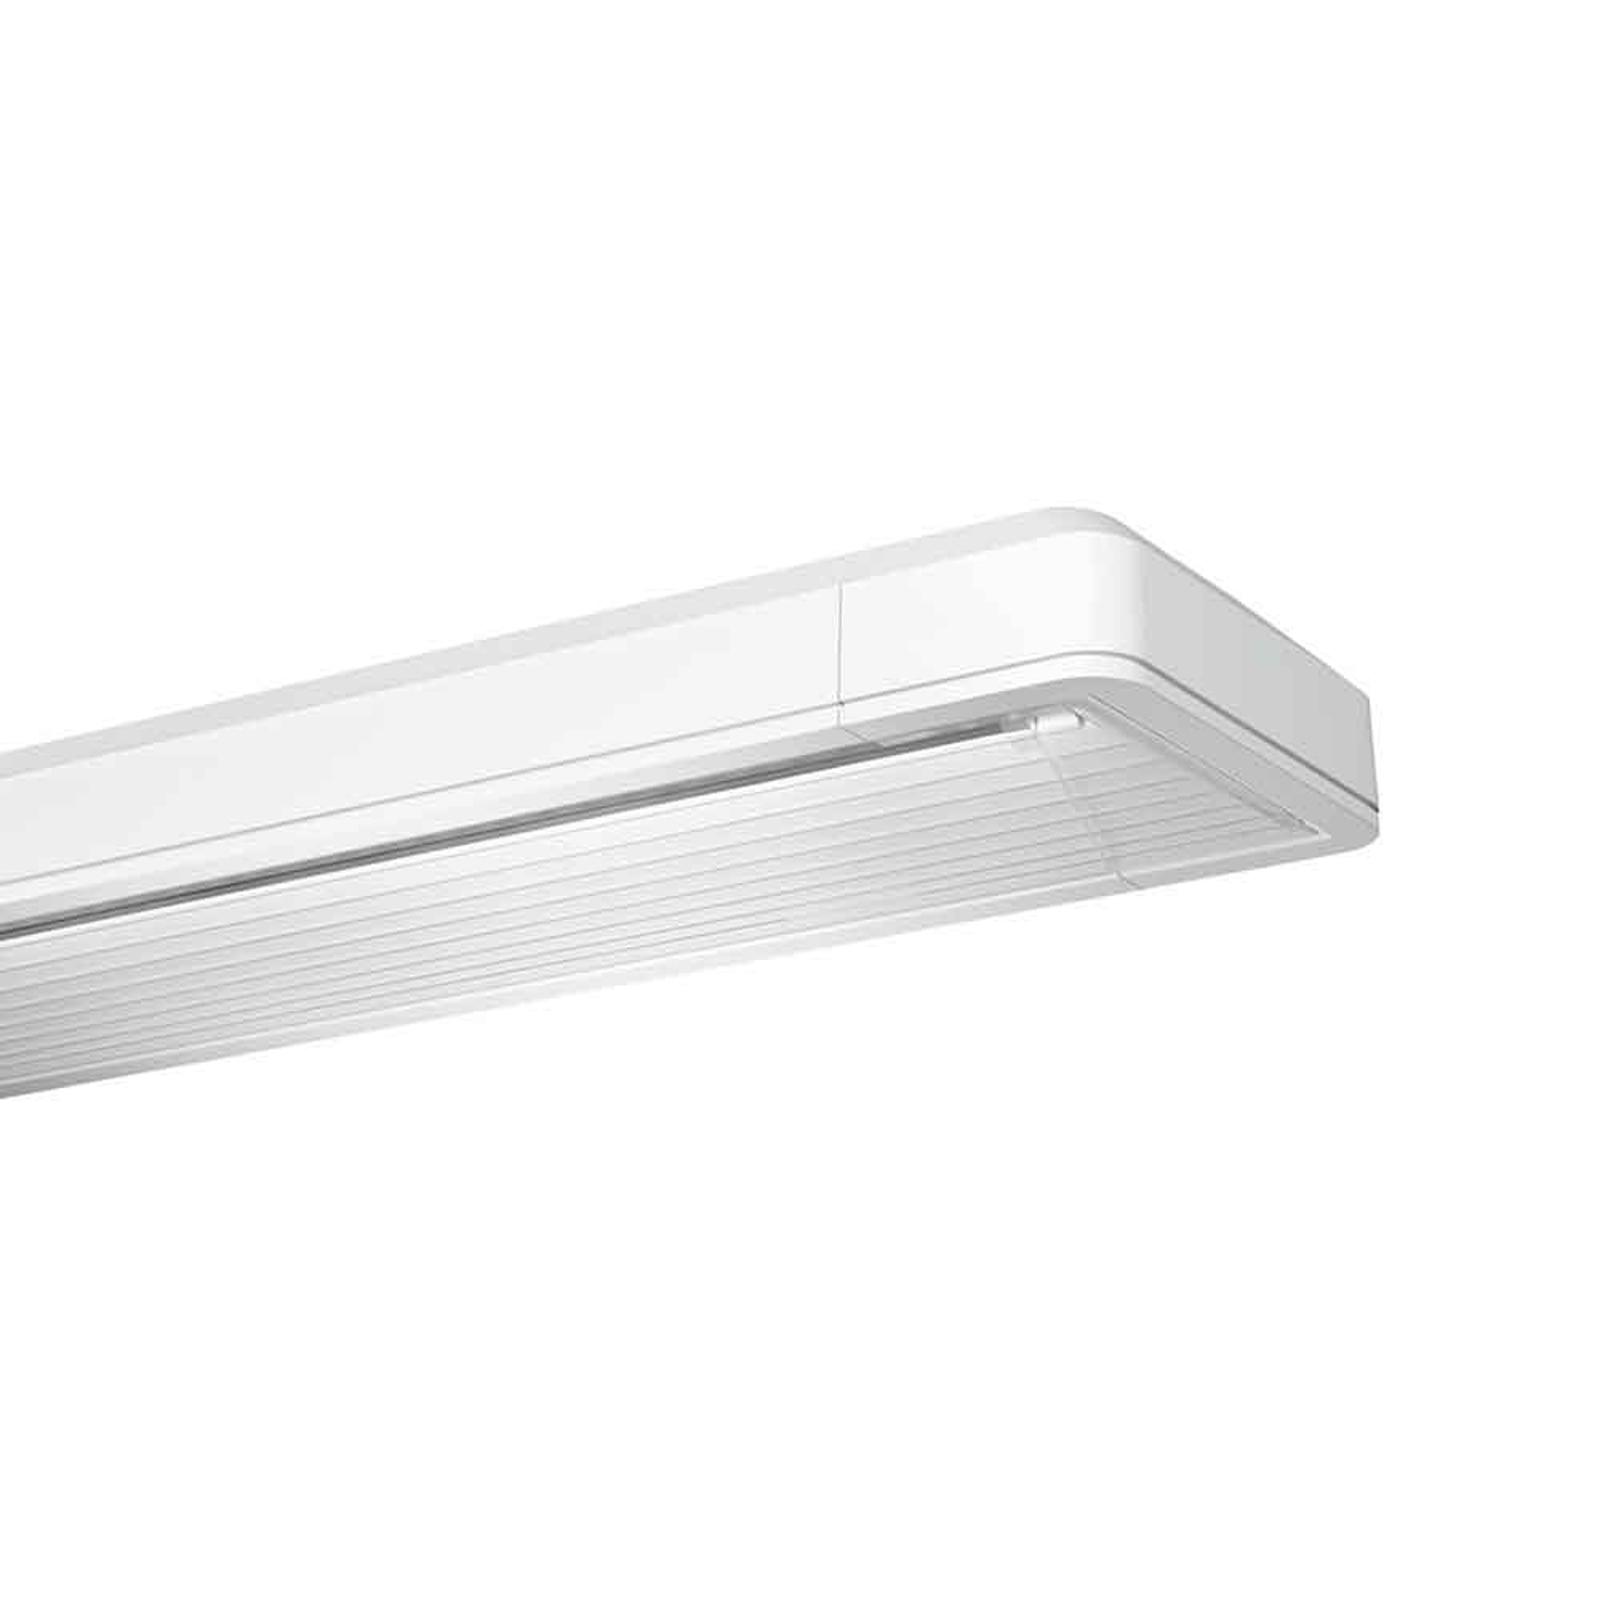 Siteco Taris LED-Deckenleuchte 151cm EVG-DALI